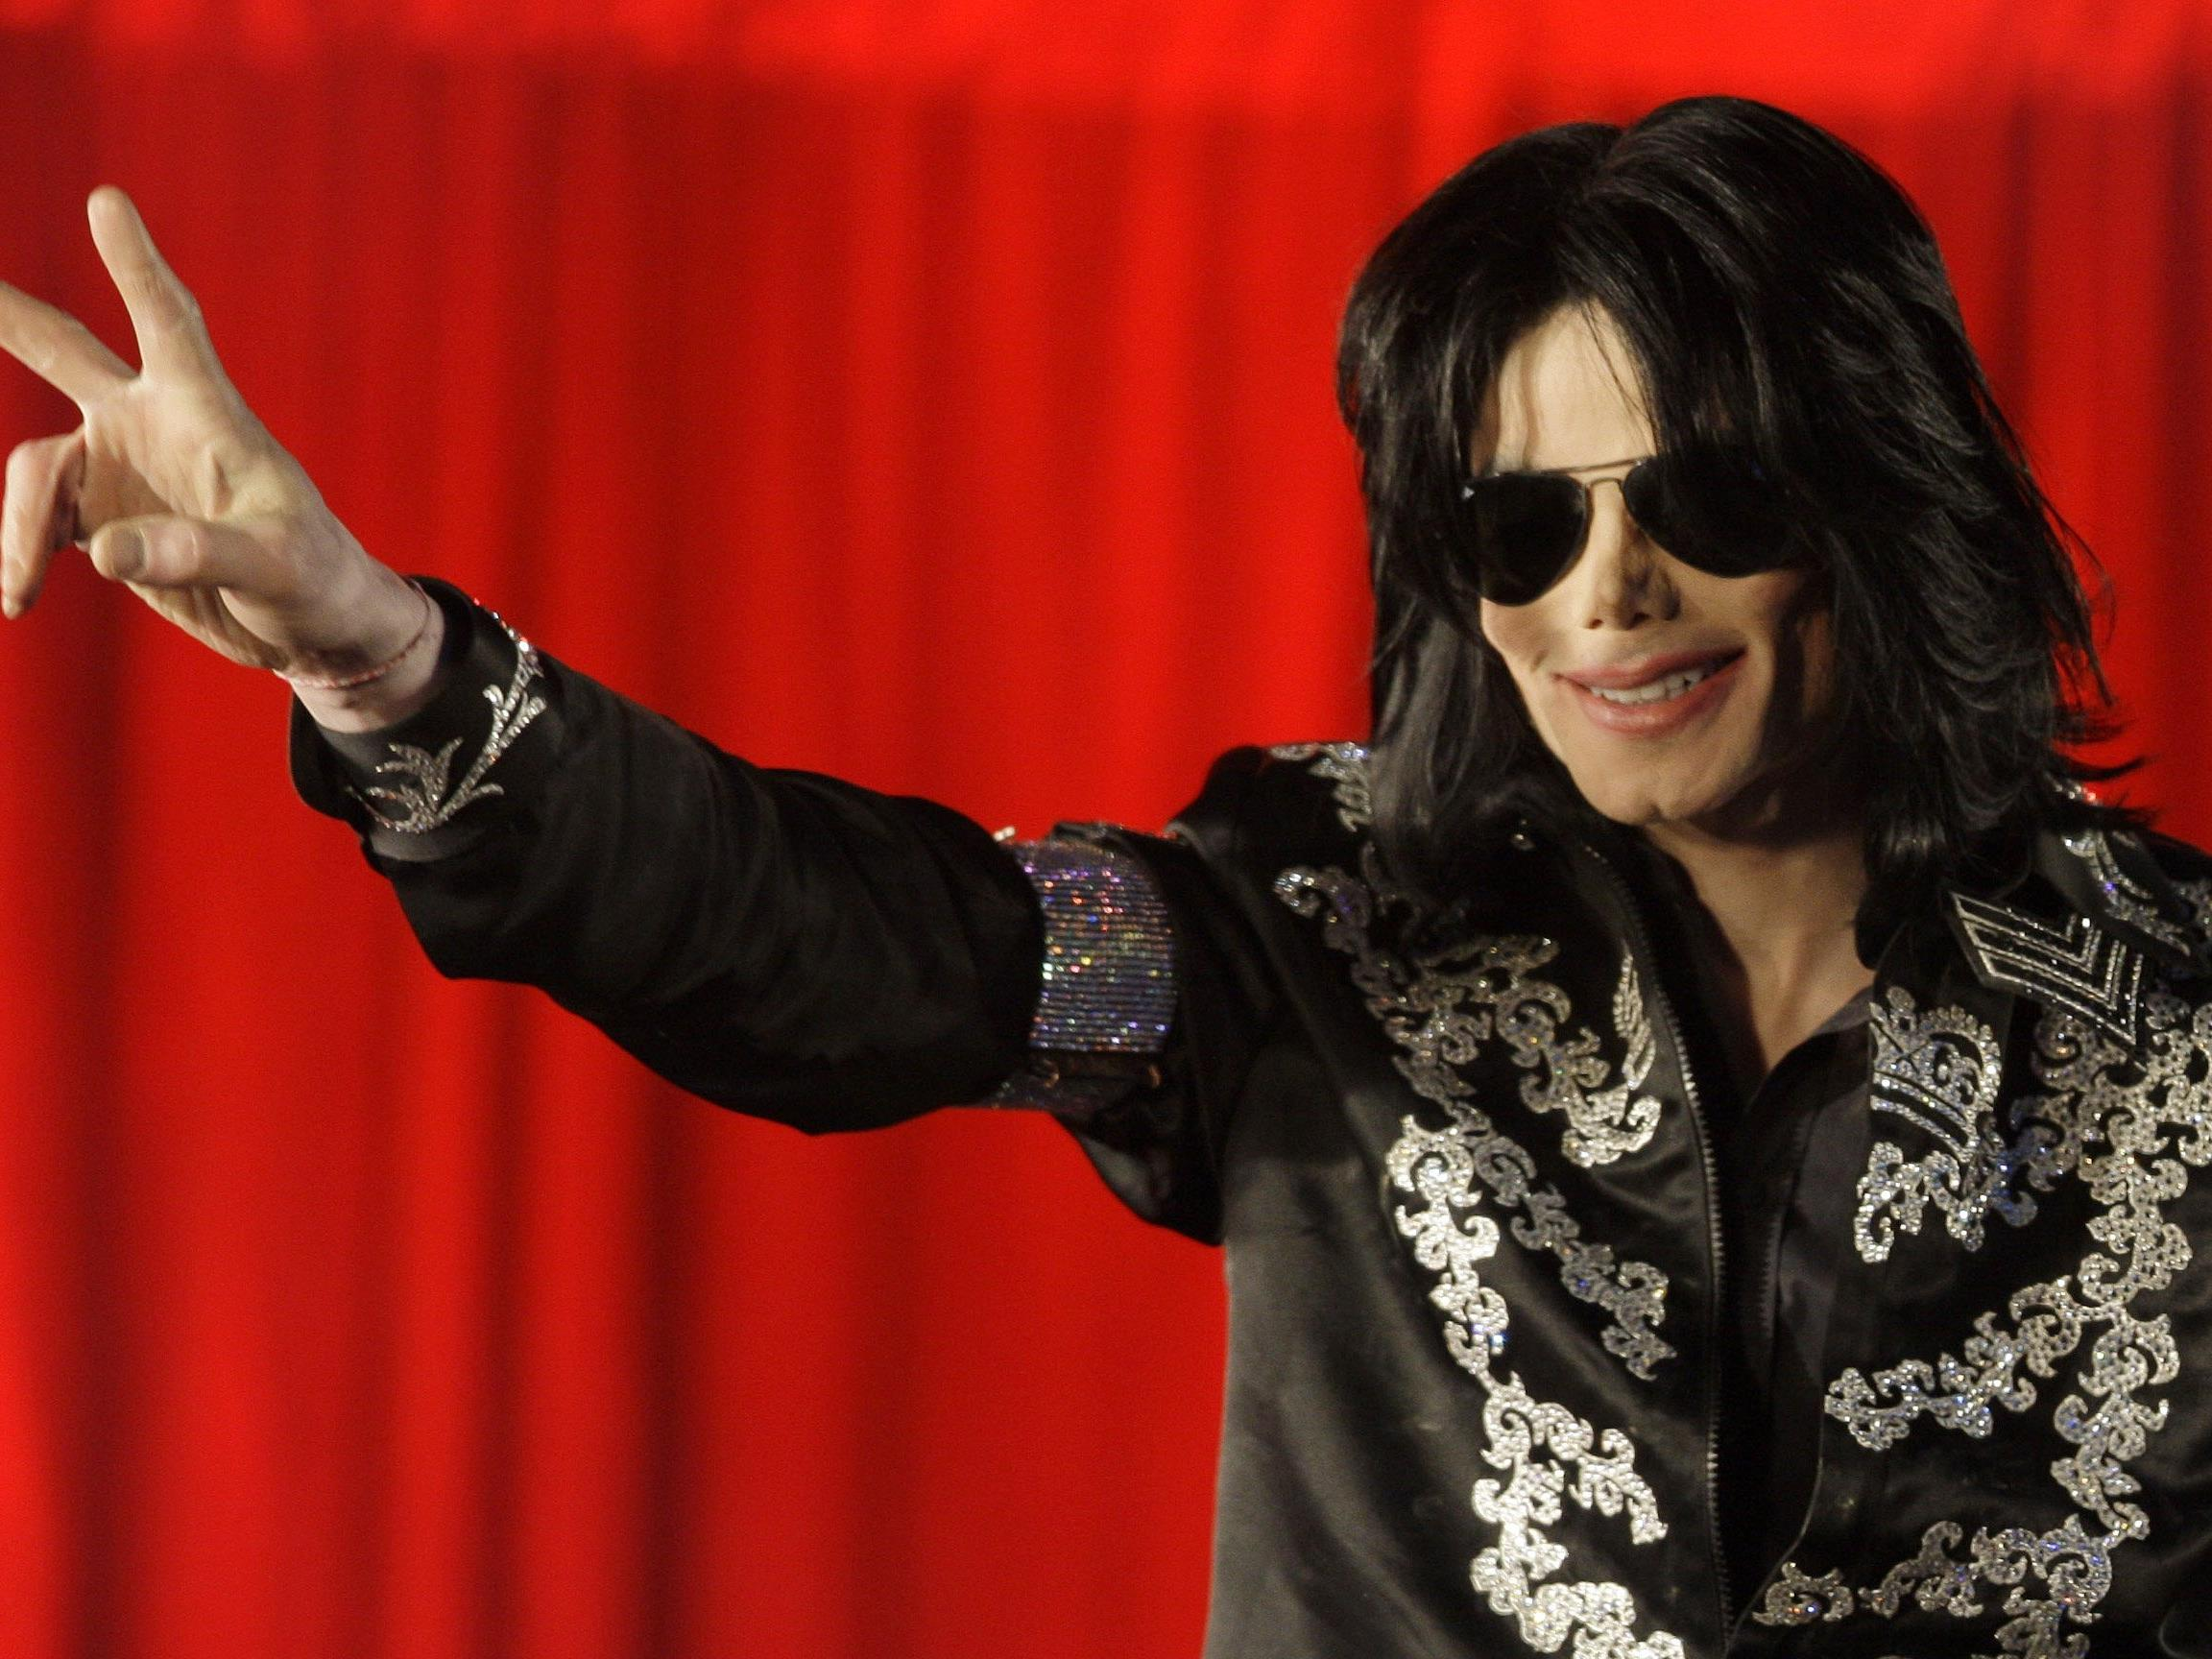 Michael Jackson verstarb 2009.